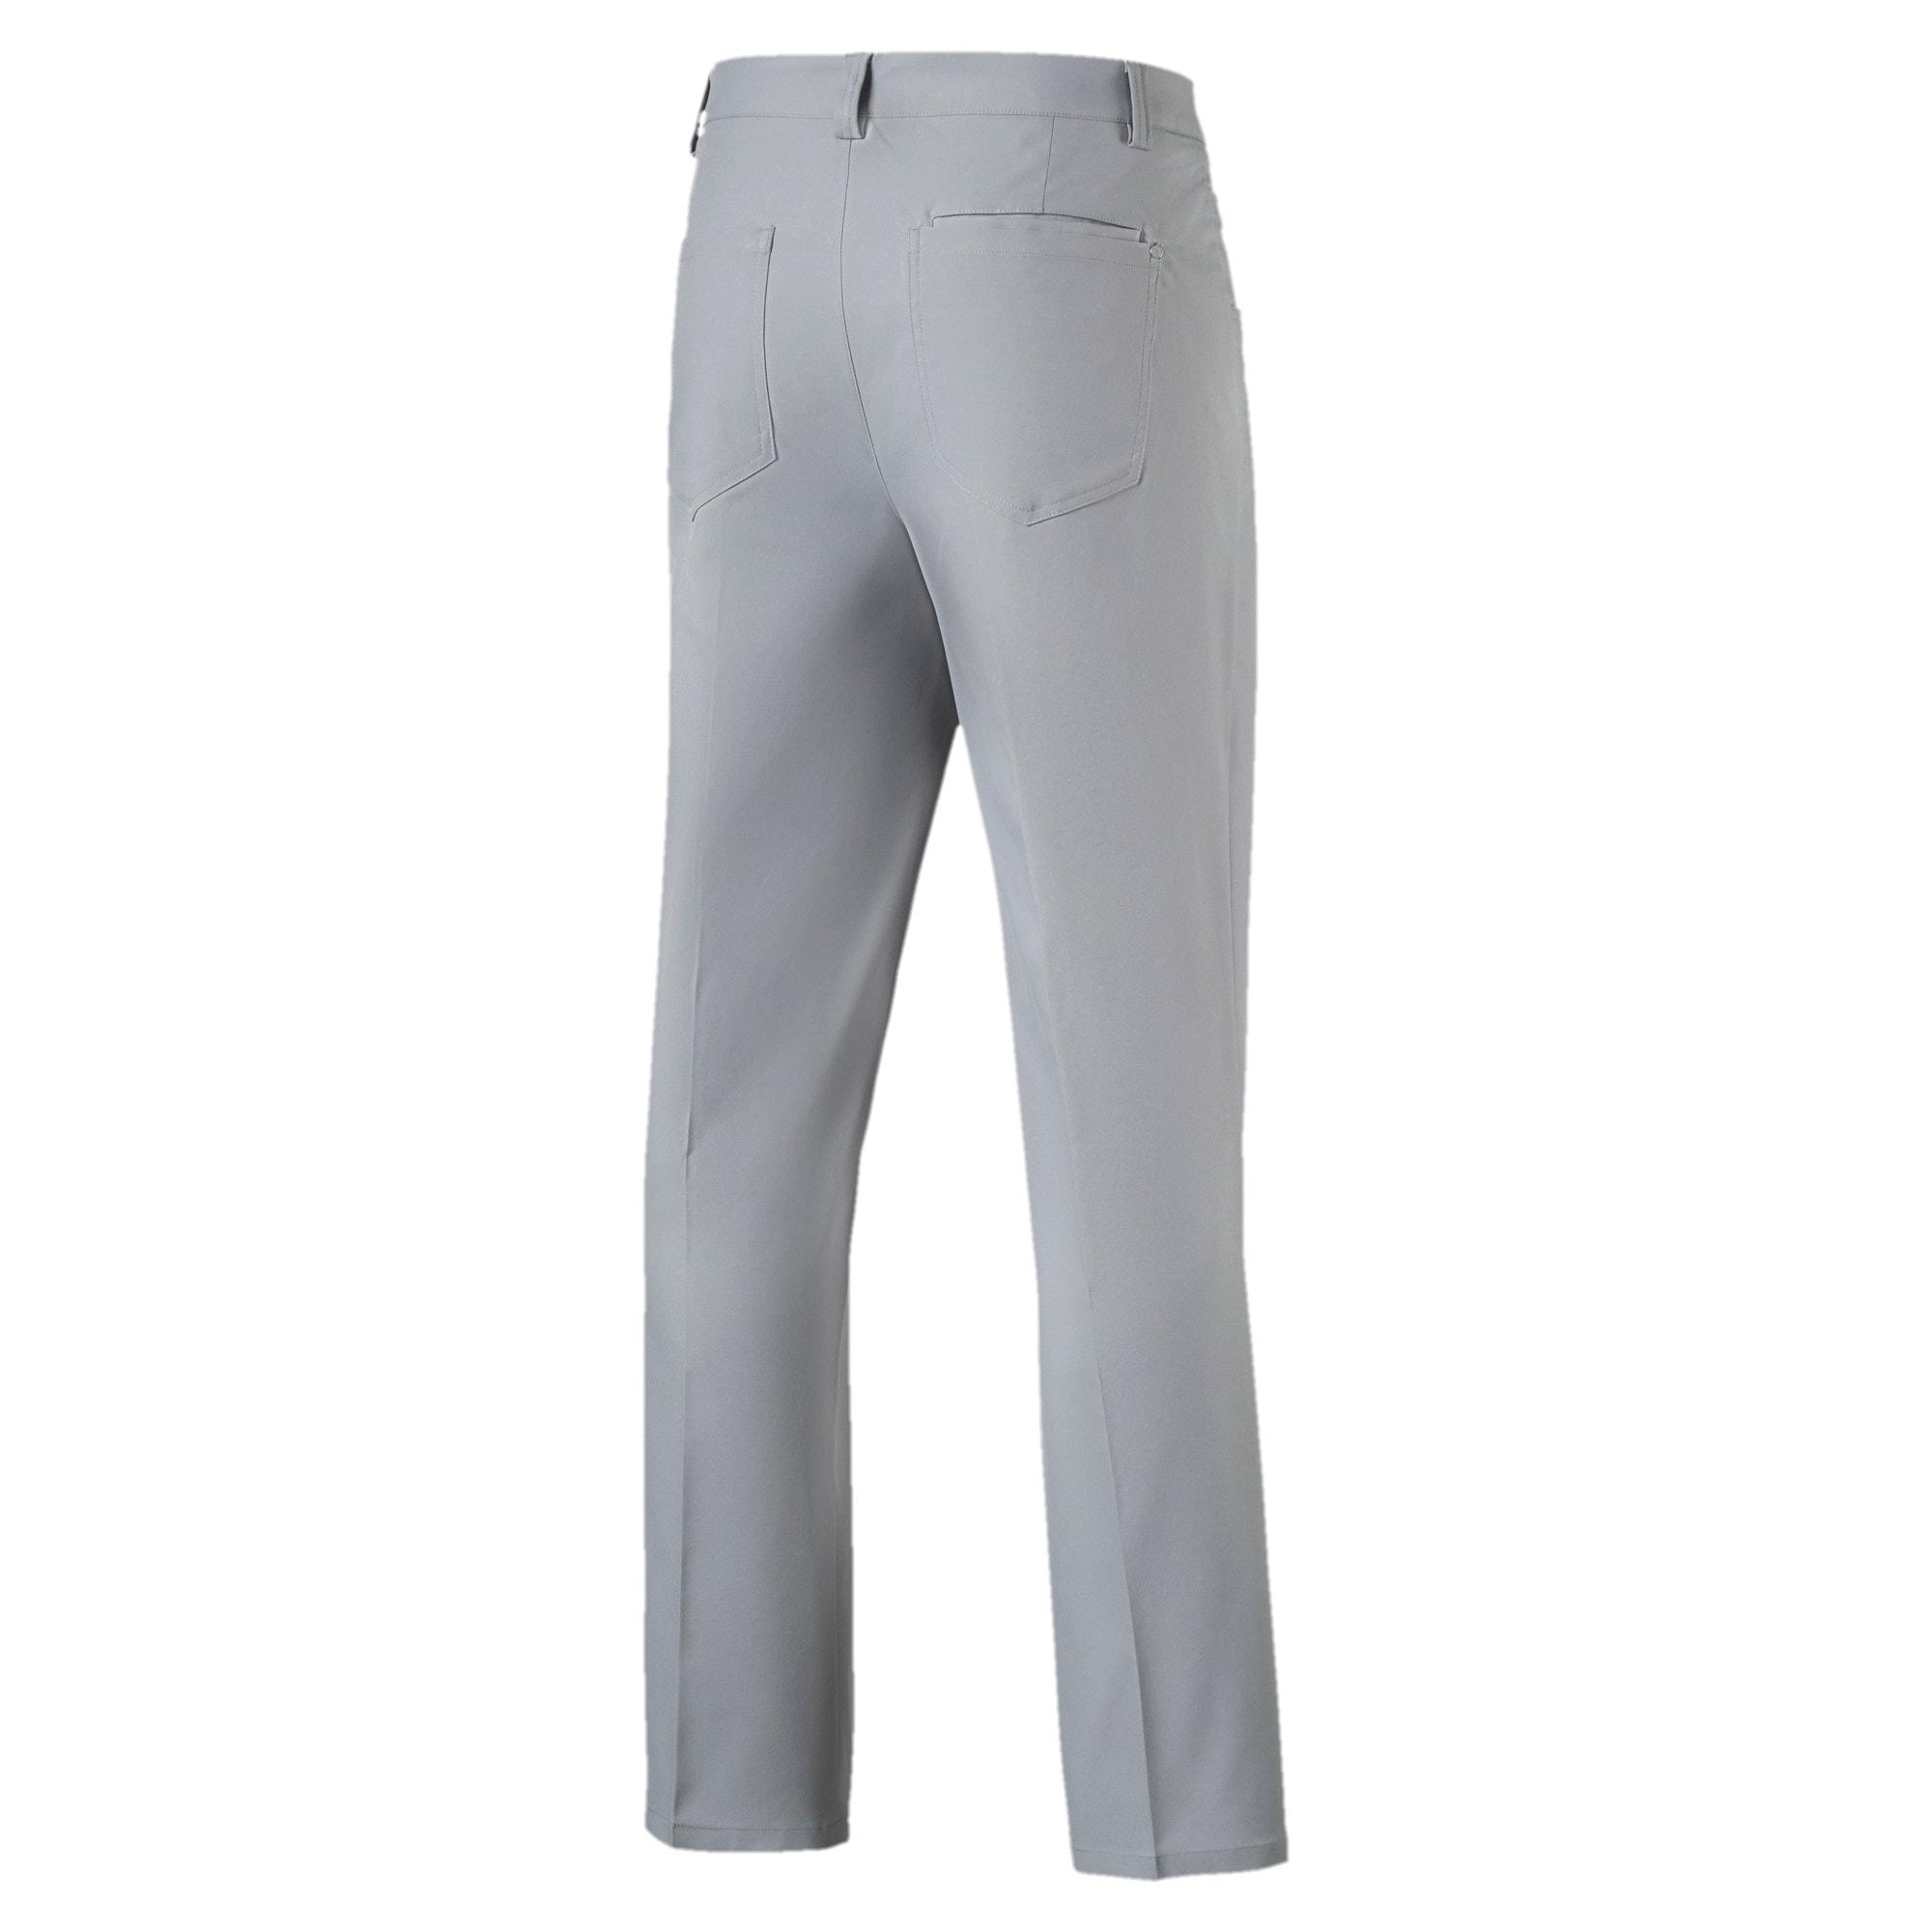 Thumbnail 4 of Men's 6 Pocket Pants, Quarry, medium